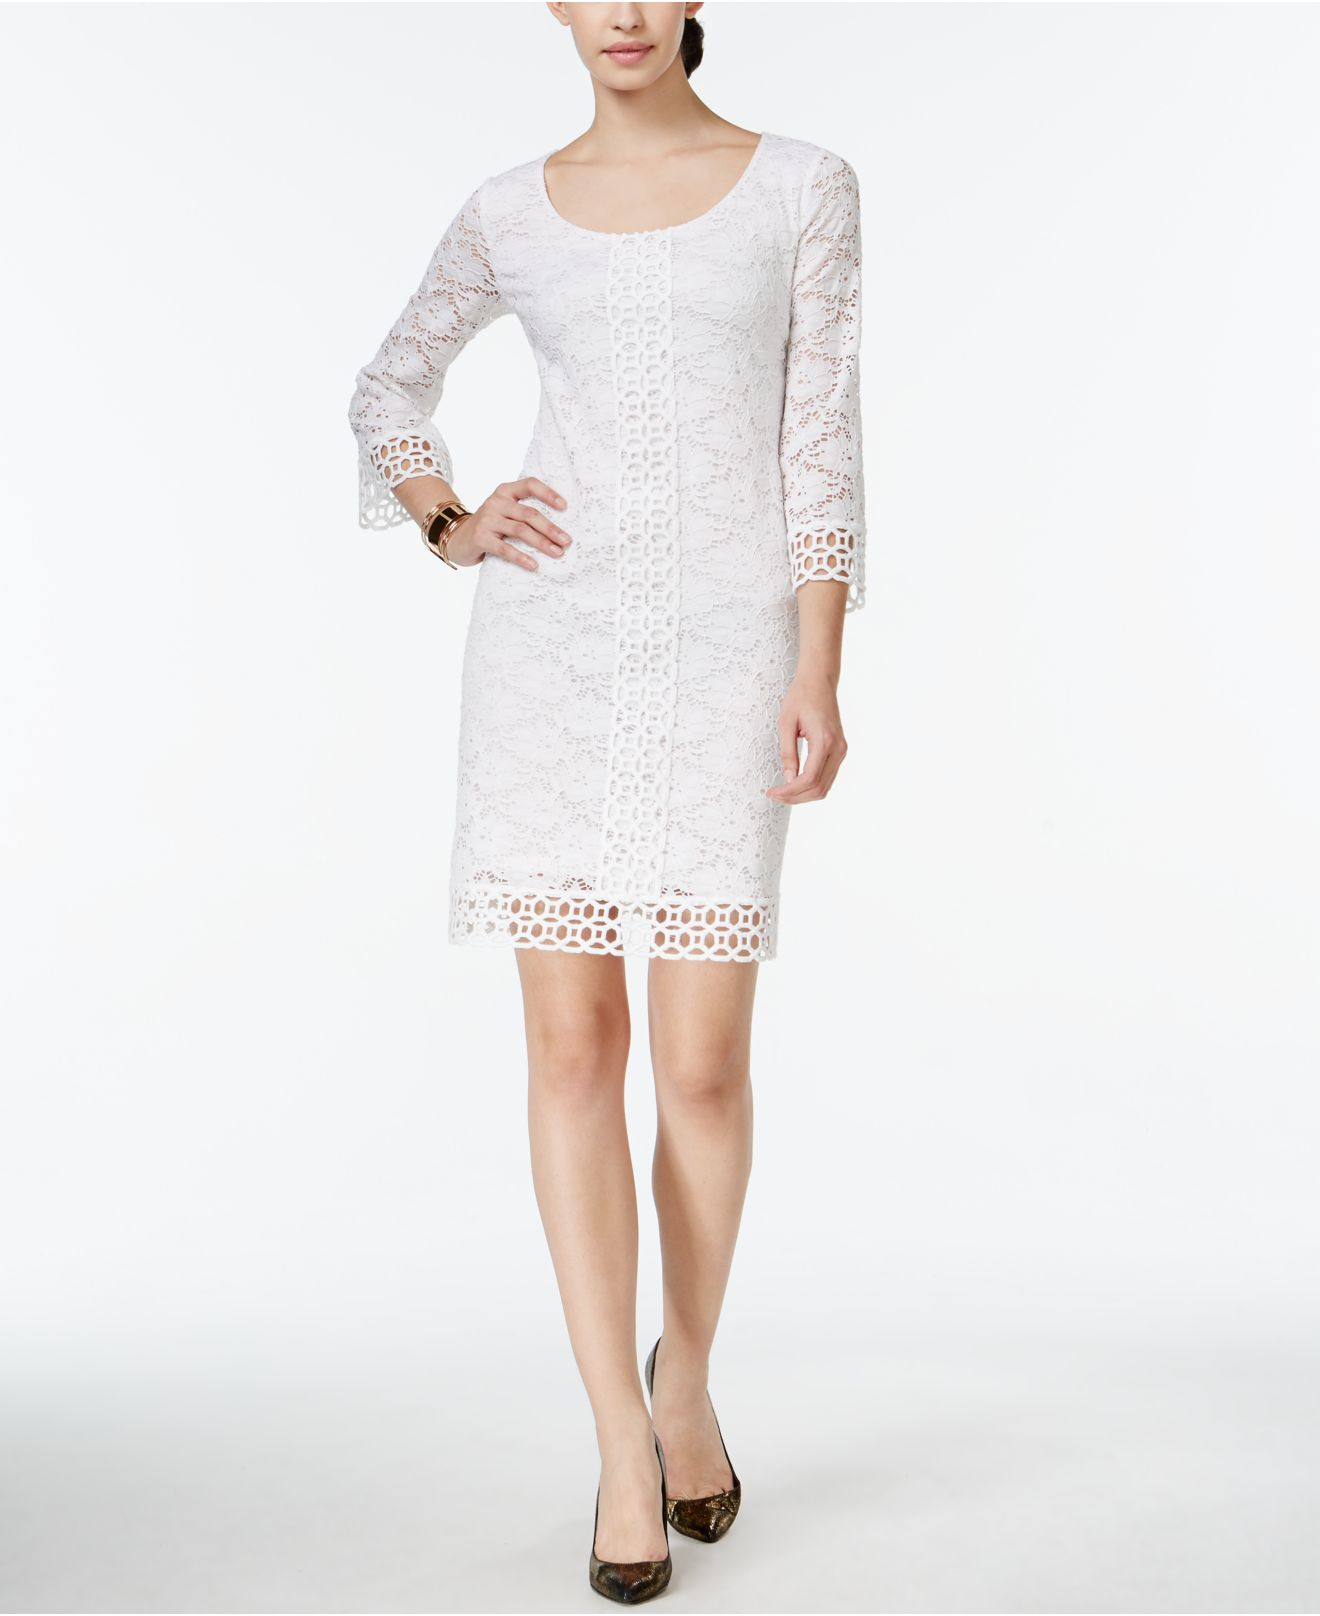 Lyst - Alfani Crochet-lace Shift Dress, Only At Macy's in ...